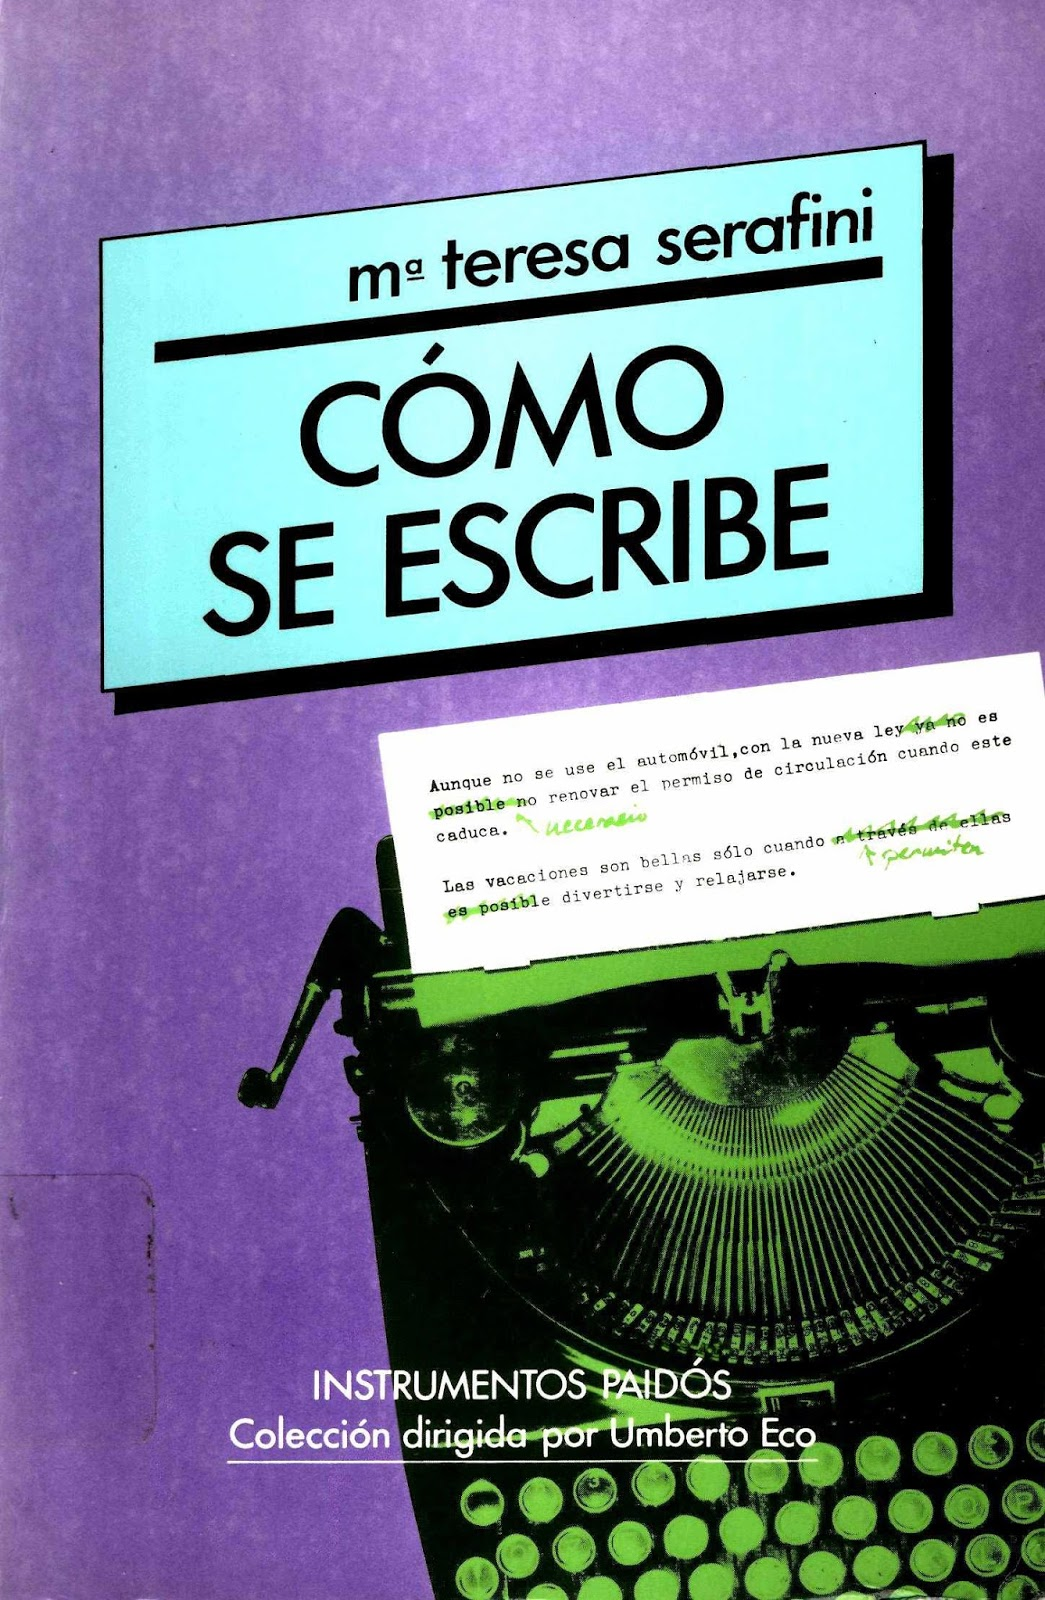 Cómo se escribe – María Teresa Serafini